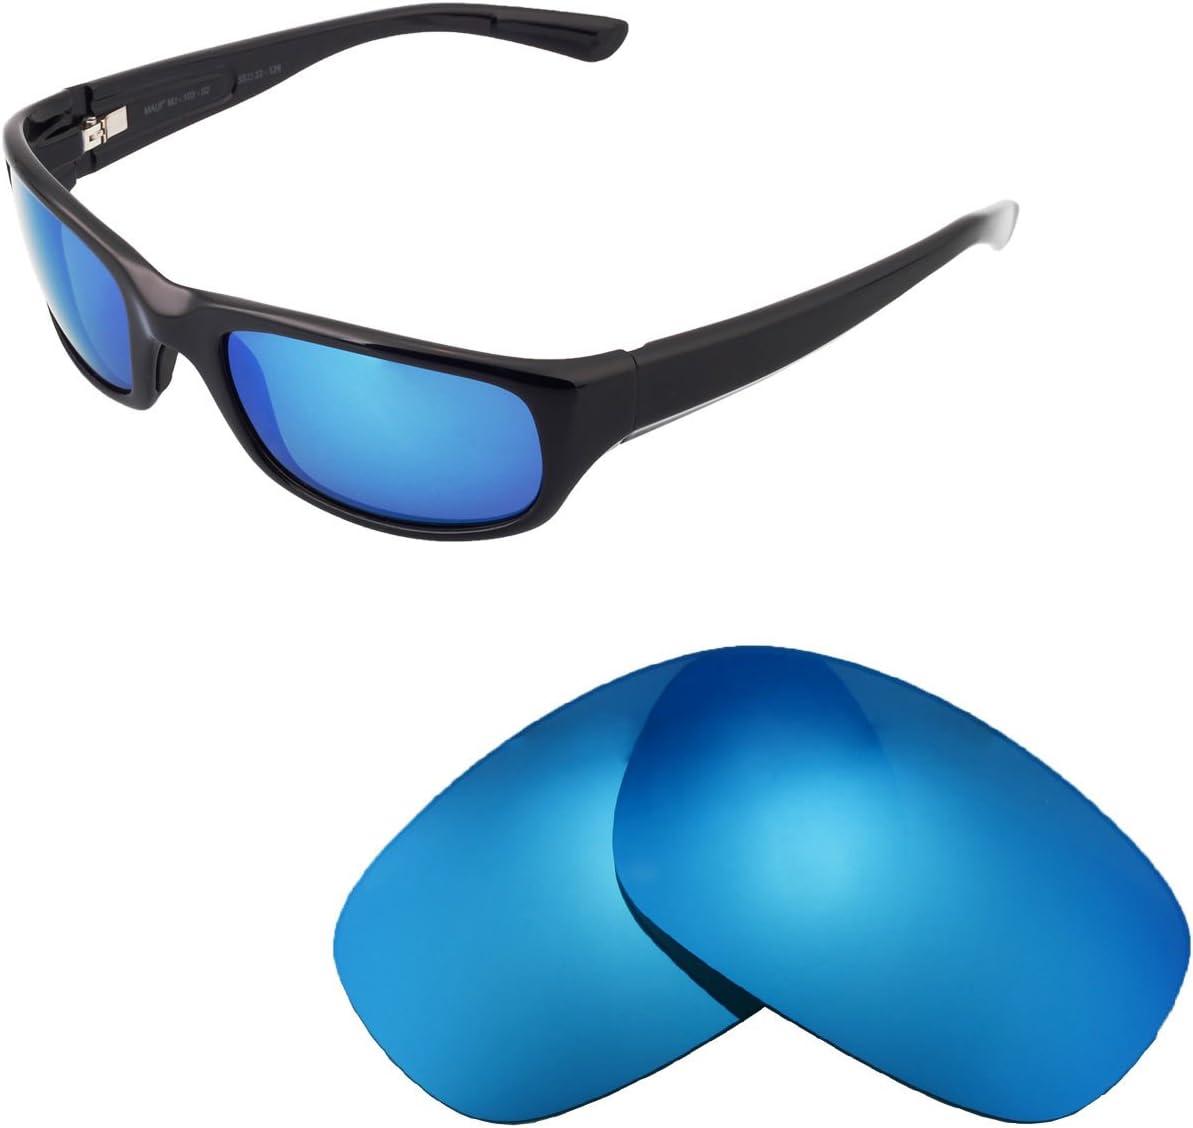 Walleva Polarized Ice Blue Replacement Lenses For Maui Jim Stingray Sunglasses